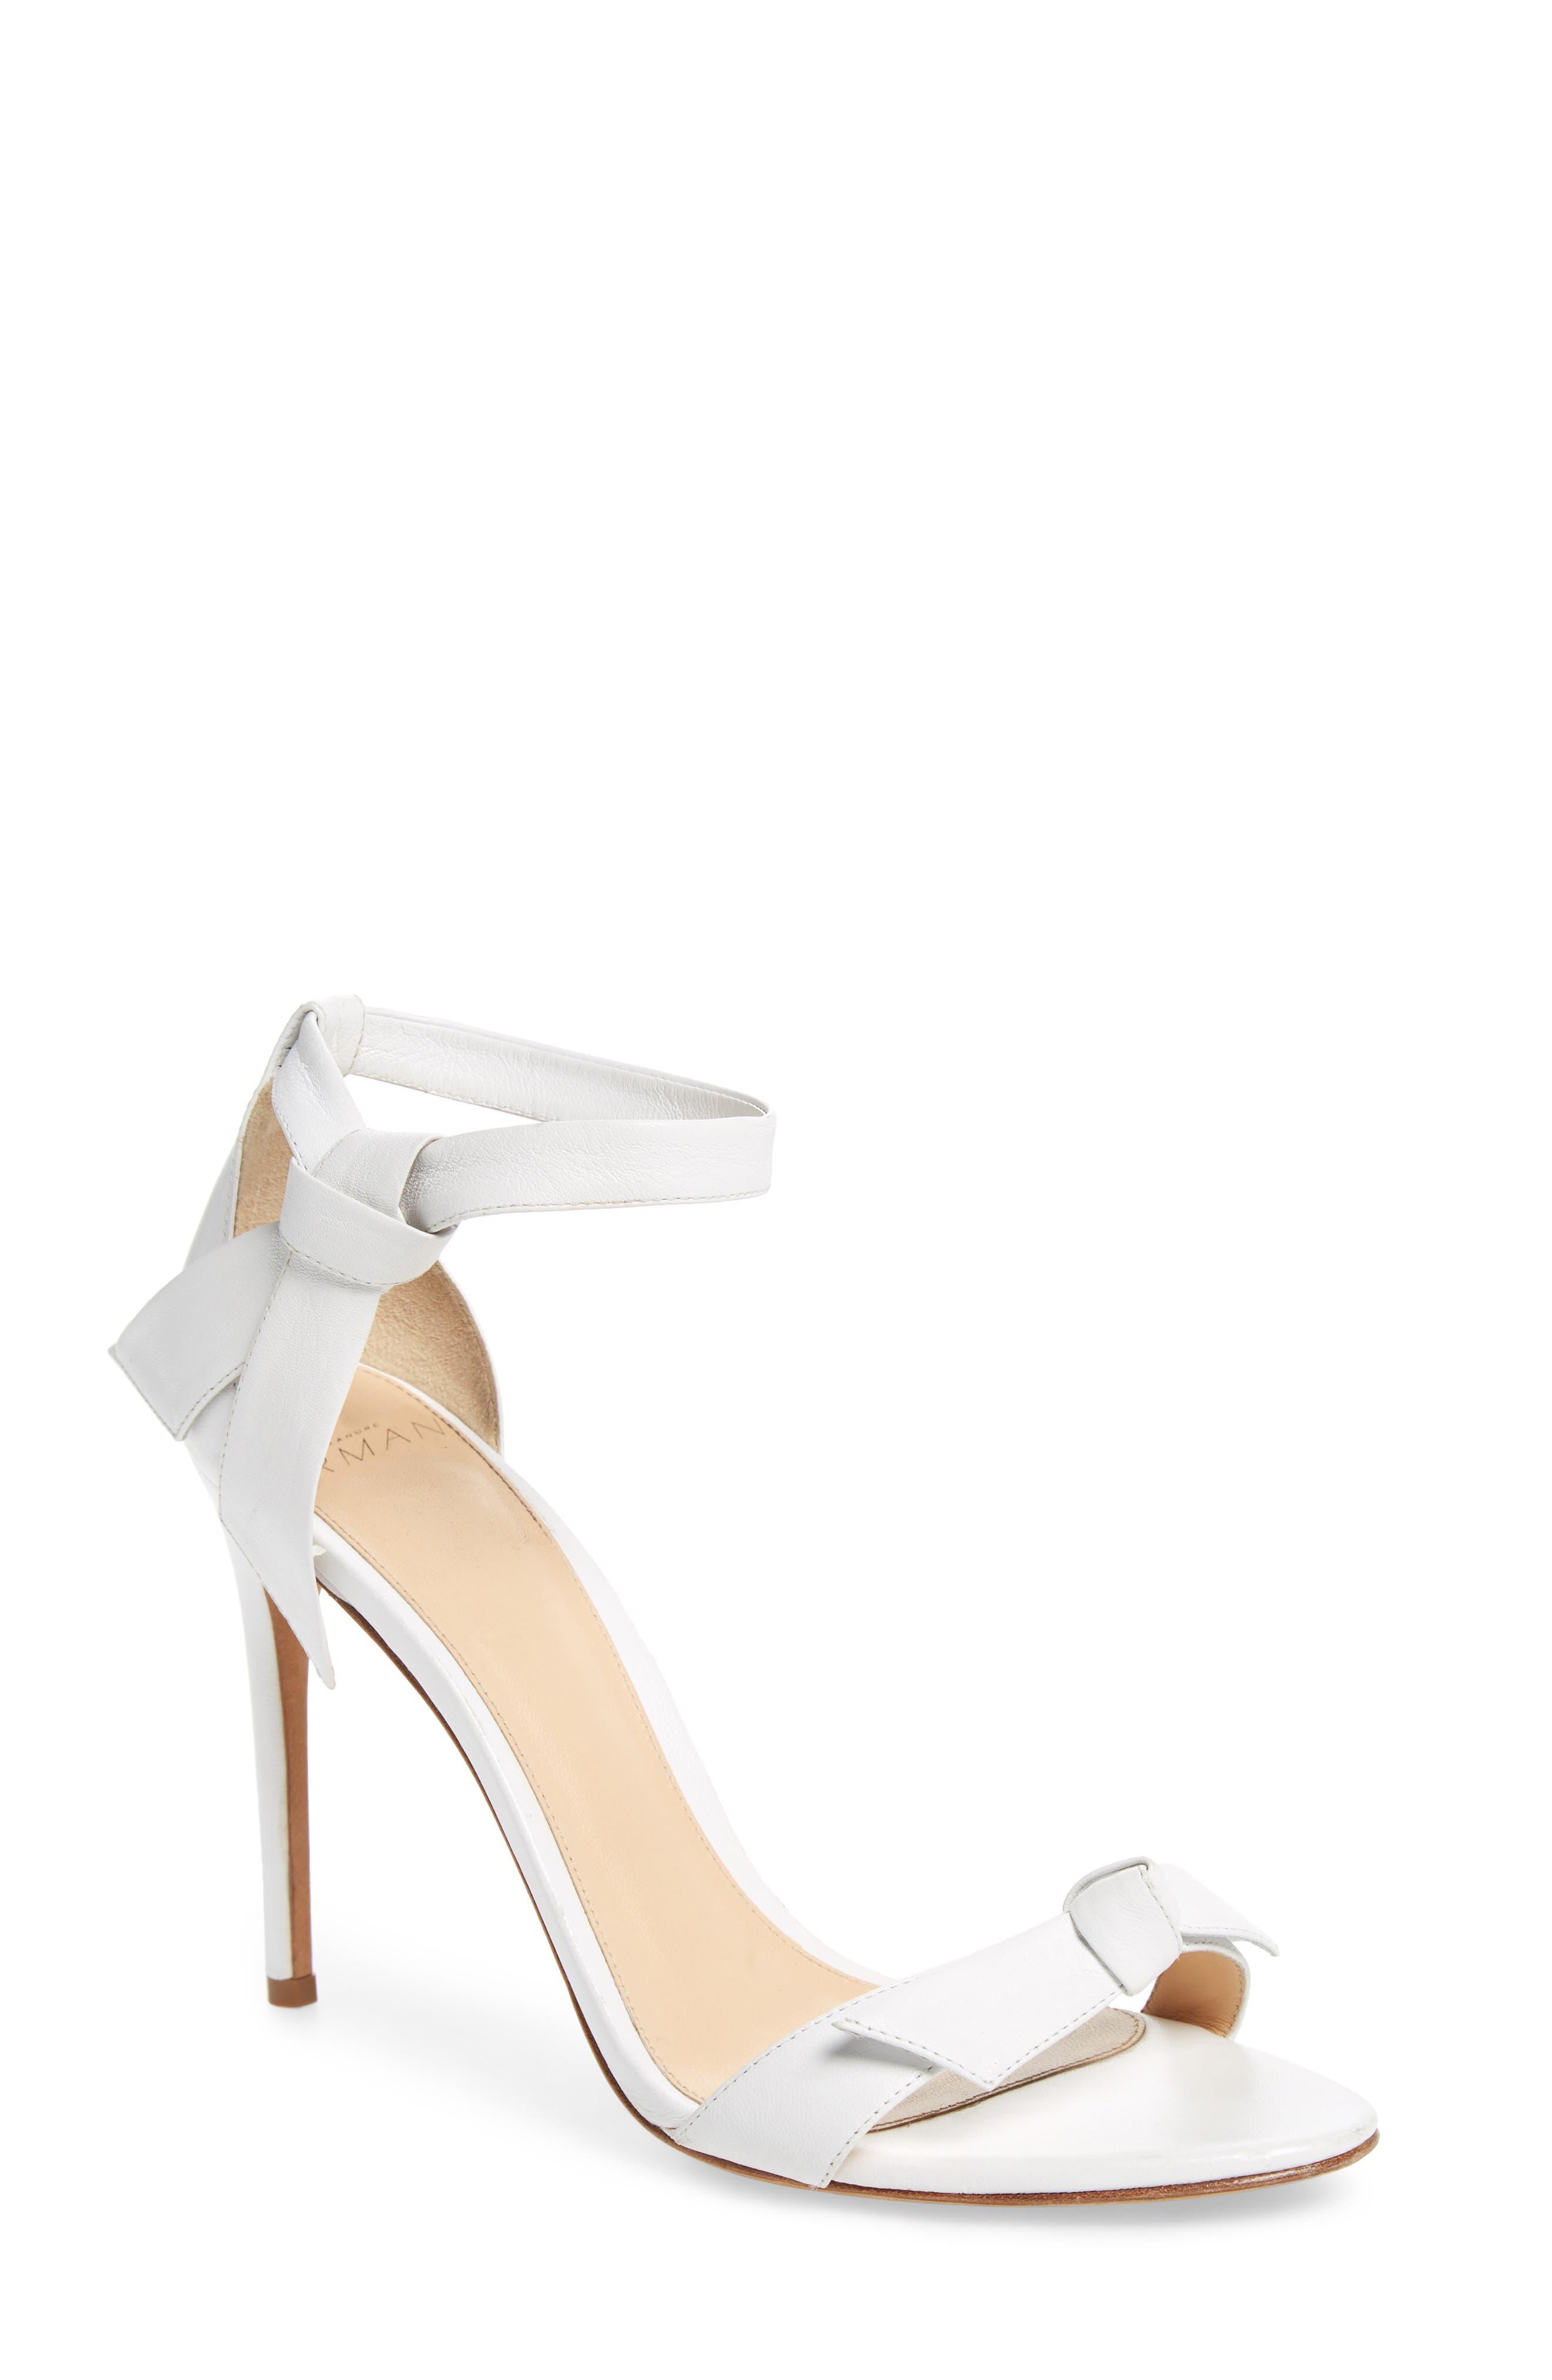 Main Image - Alexandre Birman 'Clarita' Ankle Tie Sandal (Women)